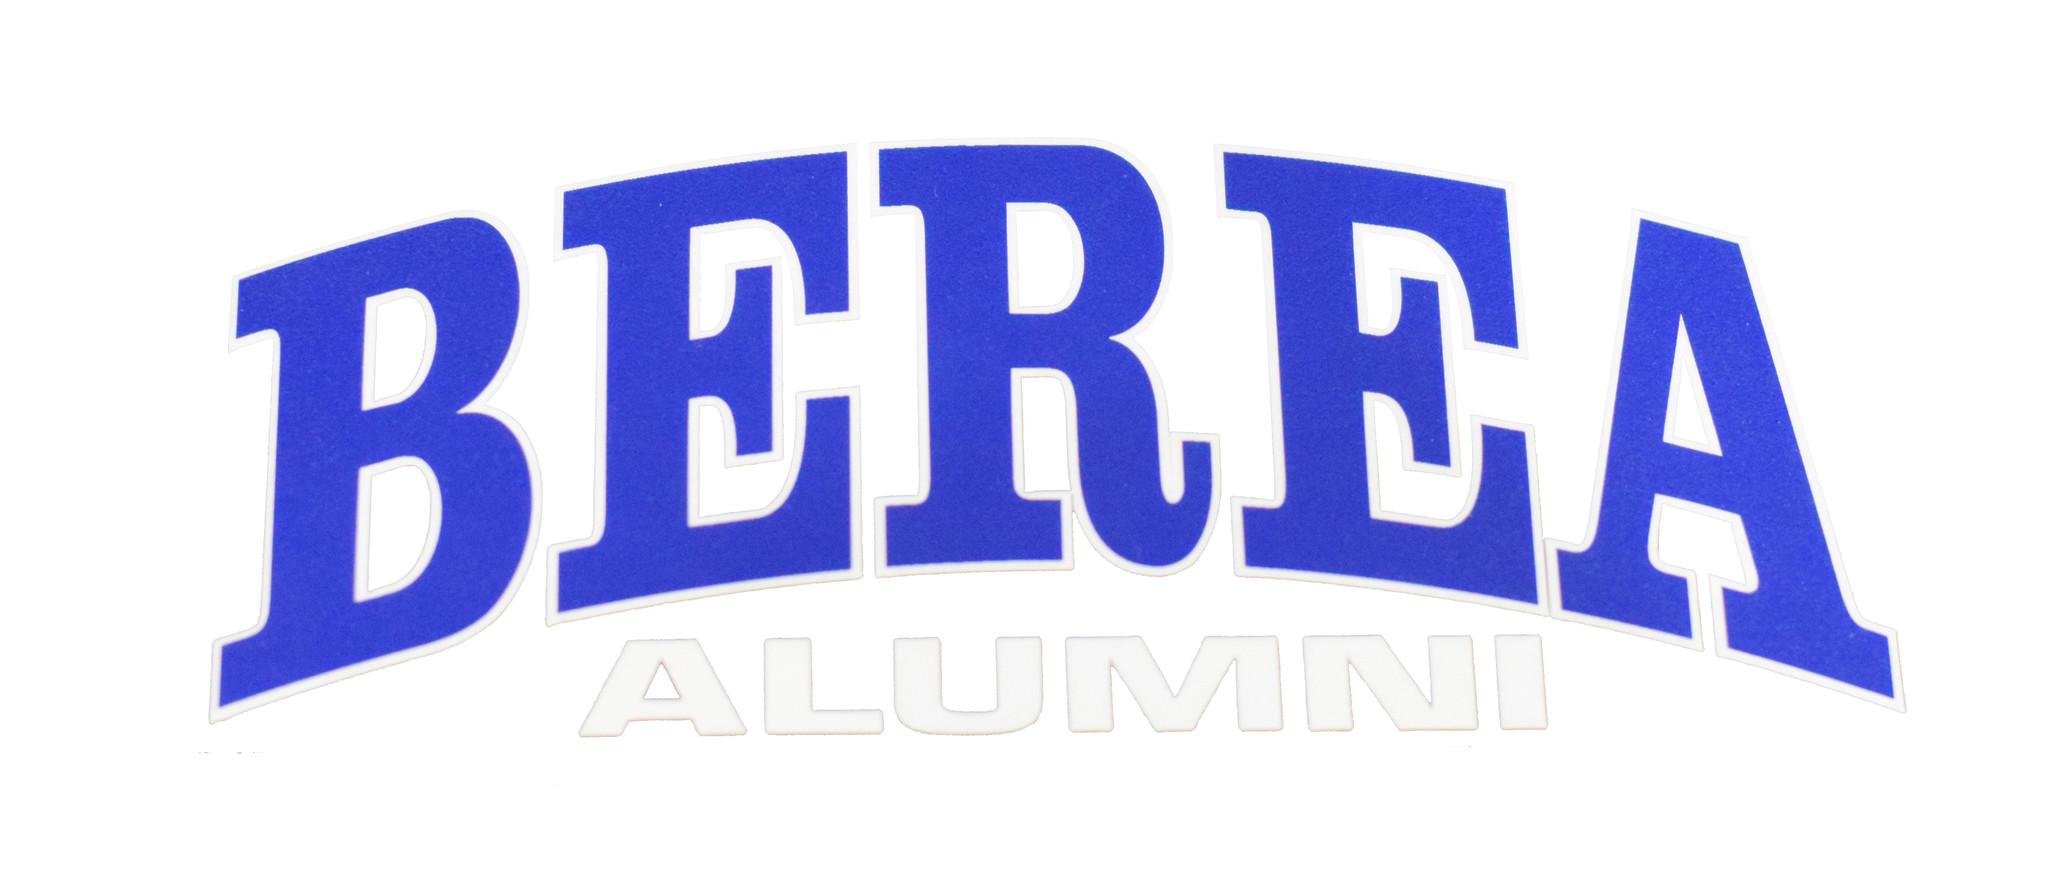 Berea Alumni Decal-1